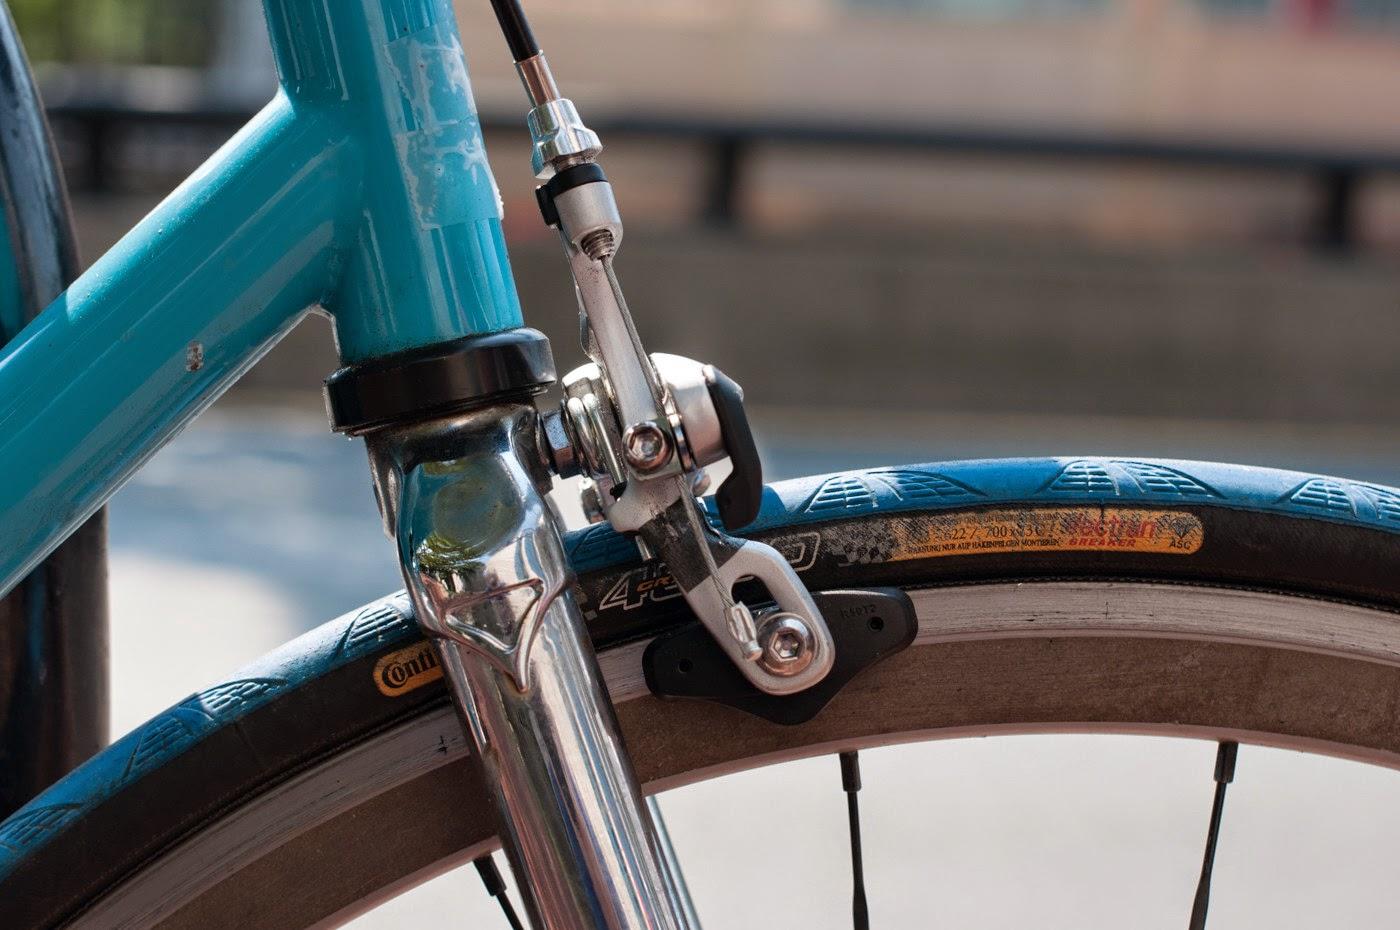 Fixie, fixed speed, bicycle, boston, USA, custom, customised, blue, tim Macauley, the biketorialist, shimano, frame, 3t, ritchey, tiagra